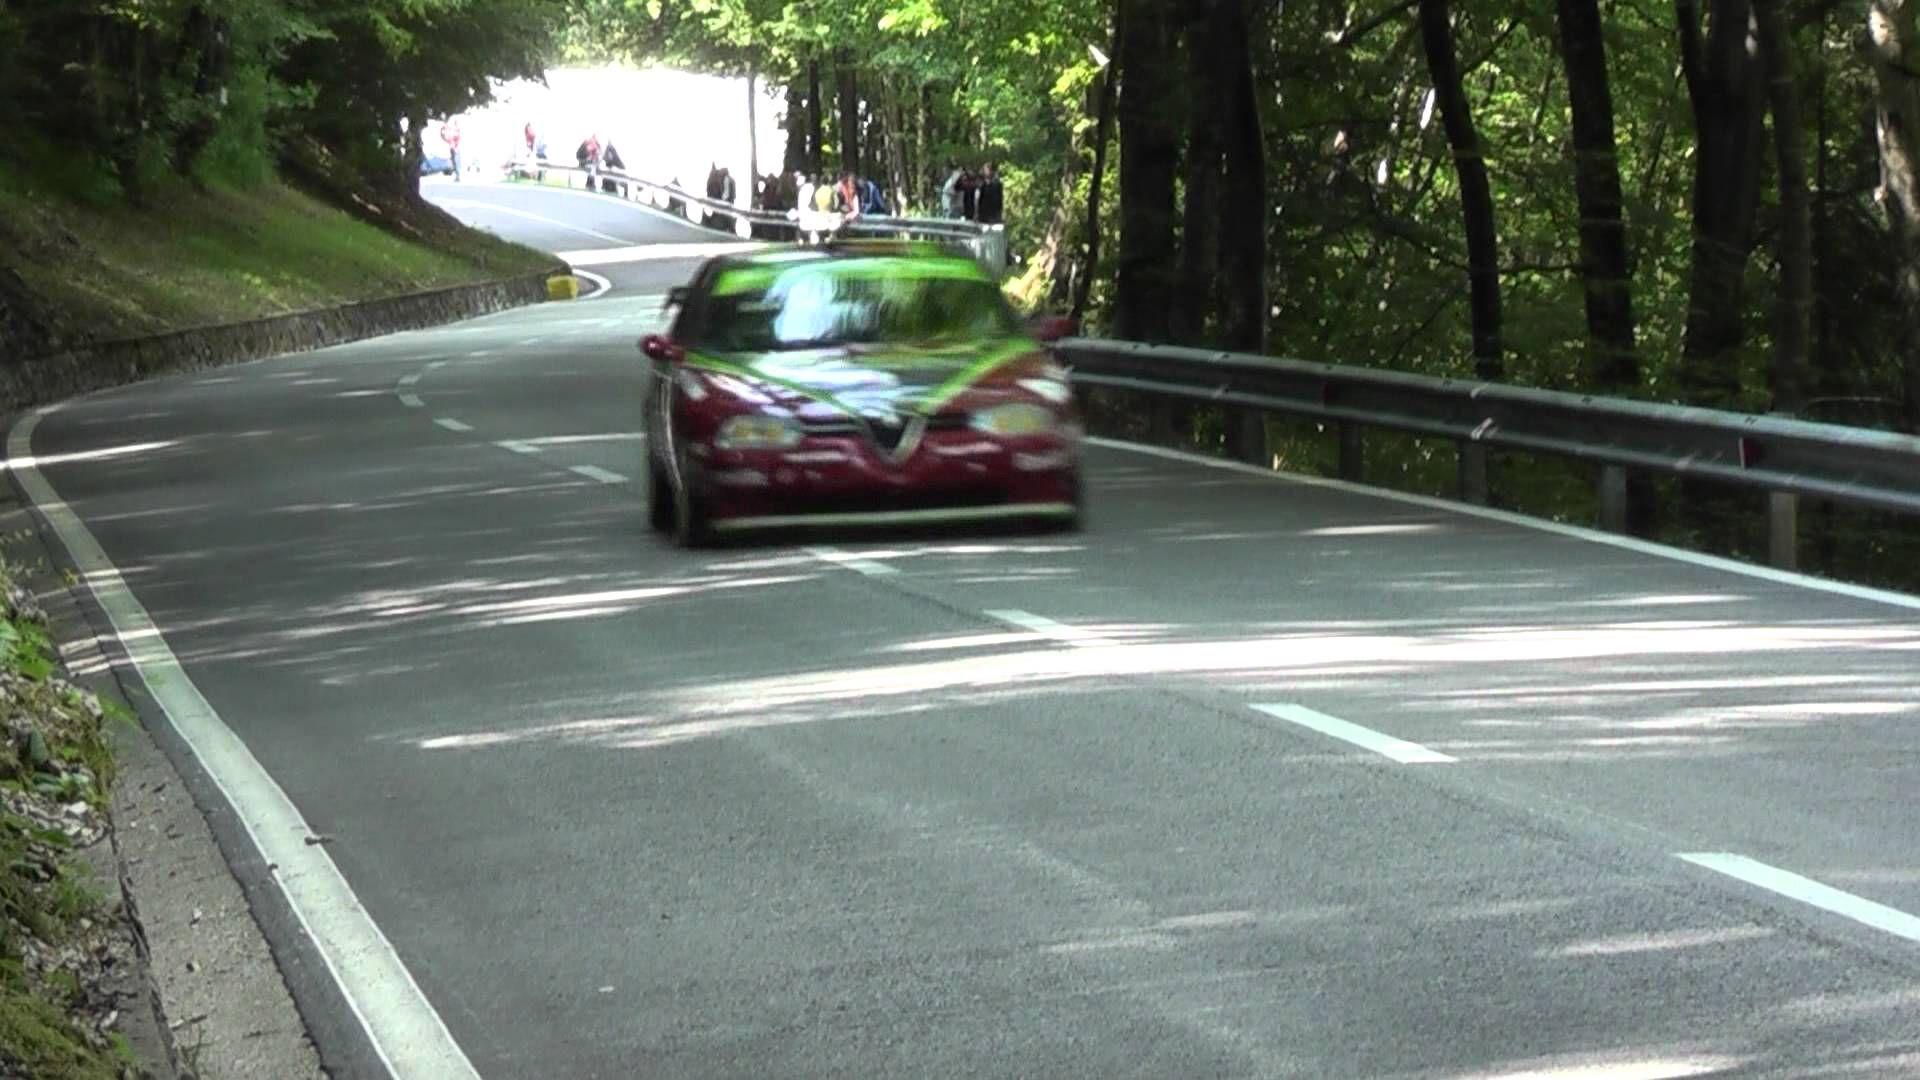 Autos und Fahrer in diesem Video: Claudio Giobbi – Alfa Romeo 156 GTA -00:10 Diethard Sternad – Alfa Romeo 156 STW -02:03 Marco Gramenzi – Alfa Romeo 155 ITC -03:48 Roberto Di Giuseppe – Alfa Romeo 155 GTA -05:31 Schöne Autos und schöner Sound..